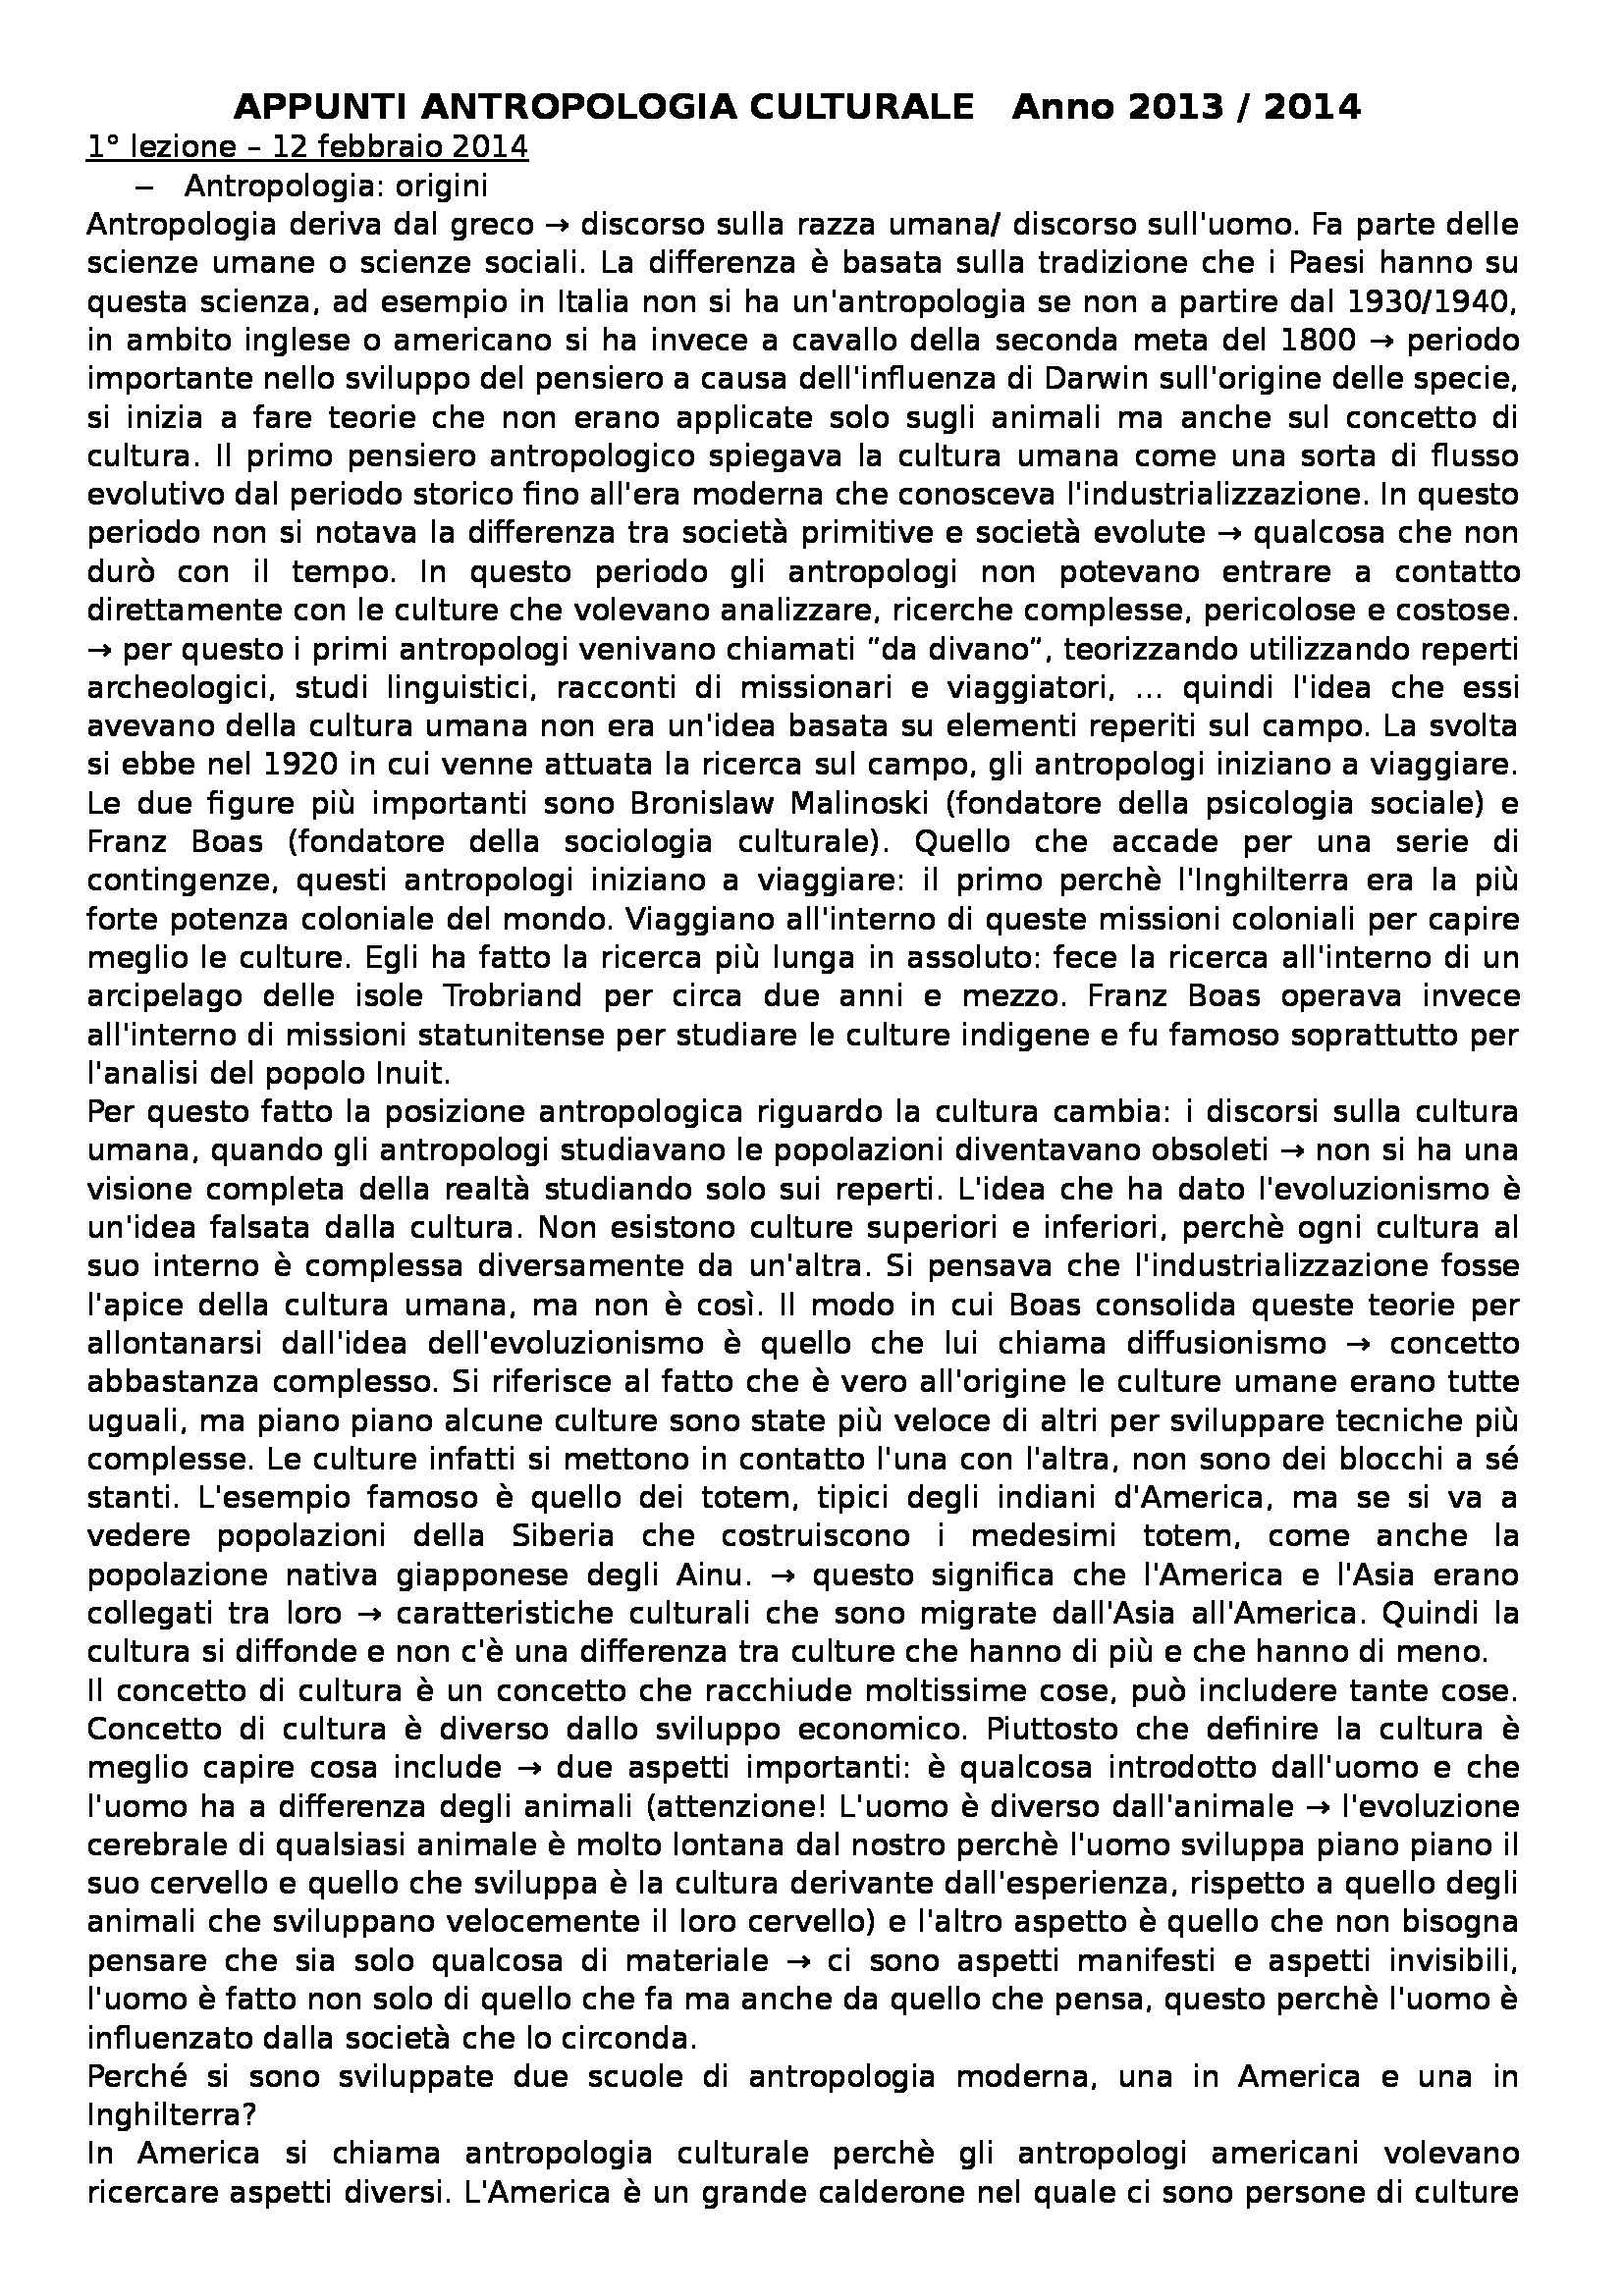 Antropologia culturale - Appunti